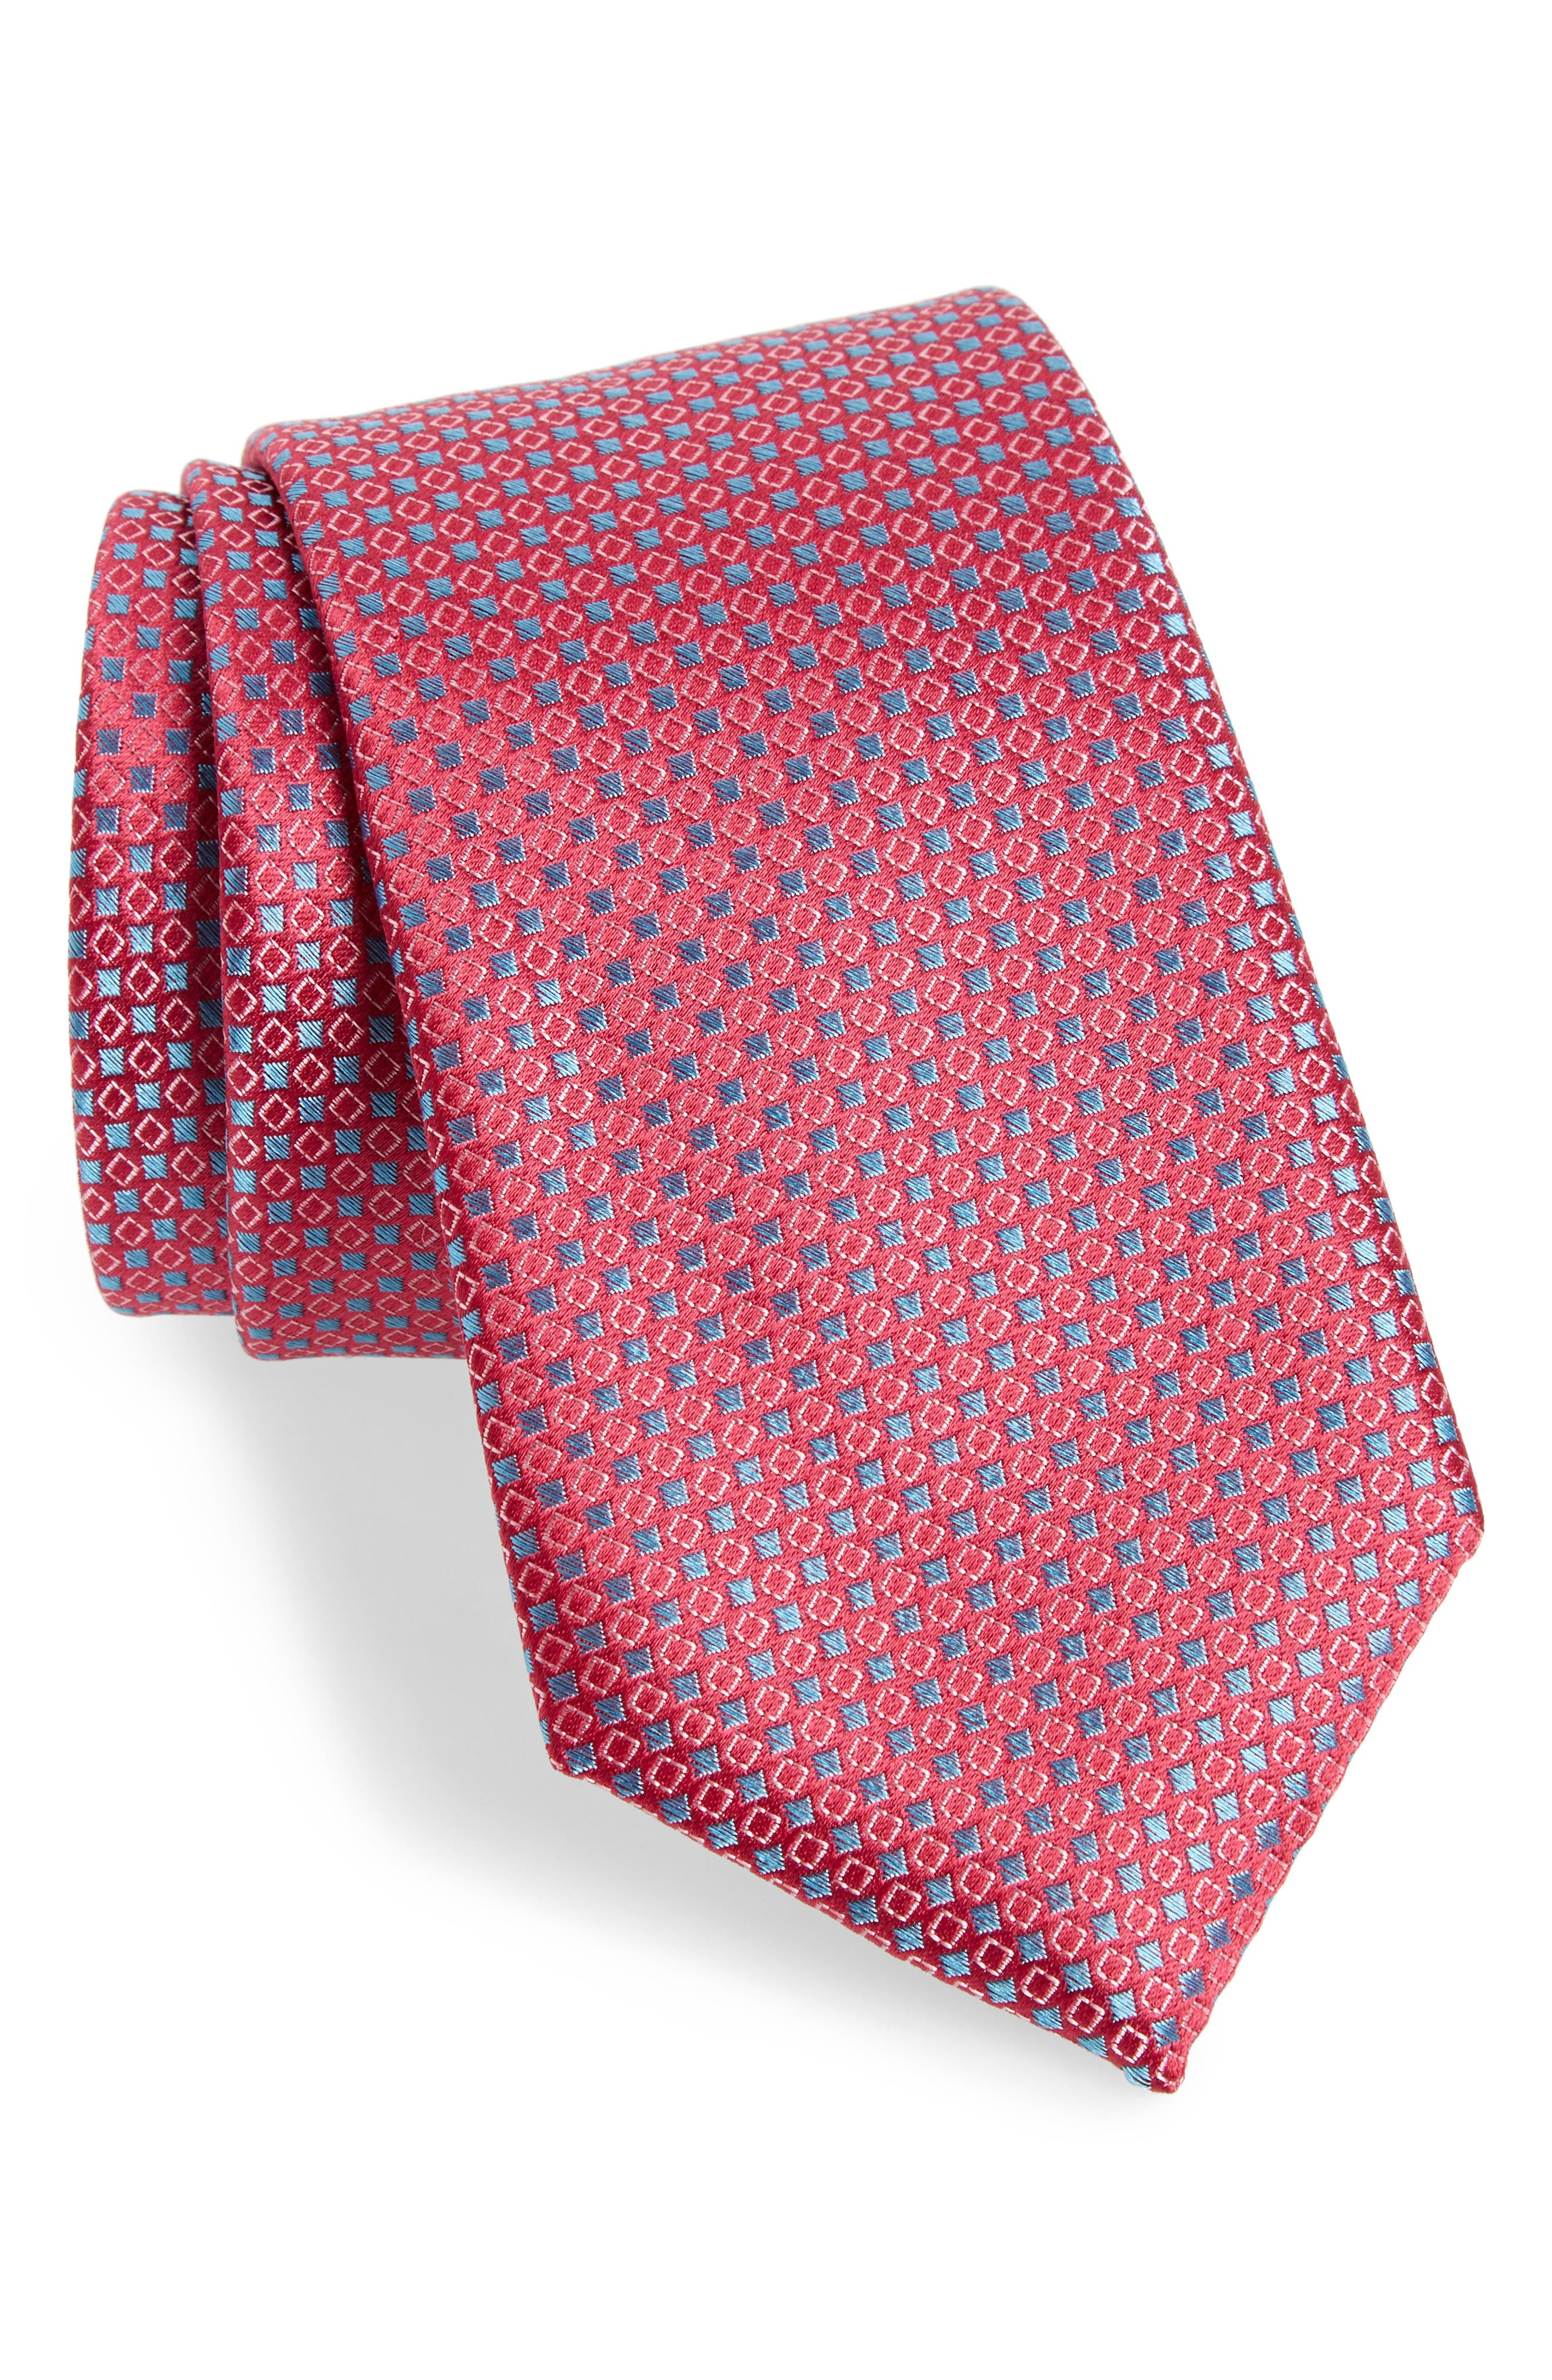 Nordstrom Men's Shop Chad Microdot Silk Tie